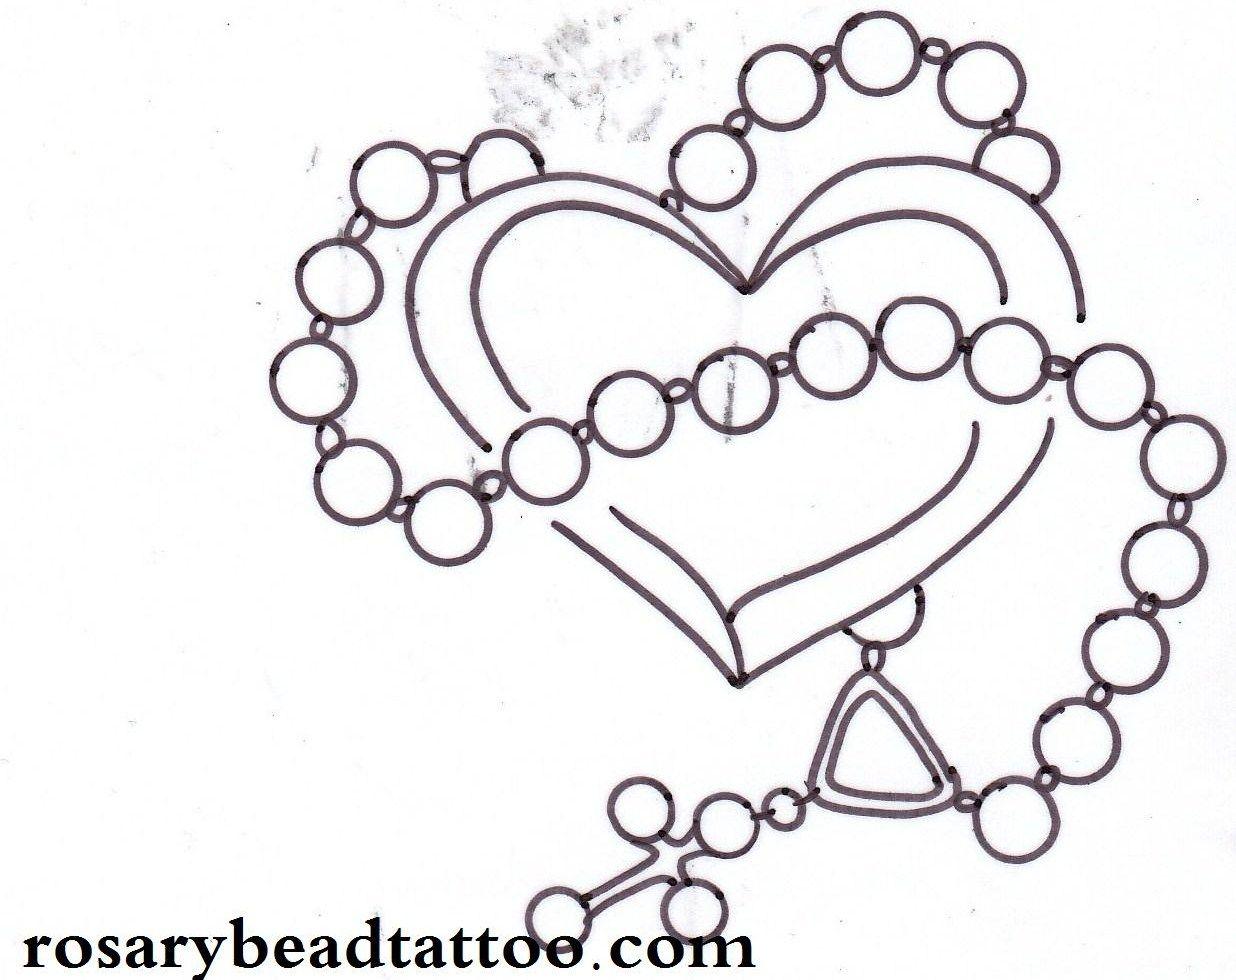 Heart tattoos designs - Cross With Heart Tattoo Design Tattooshunt